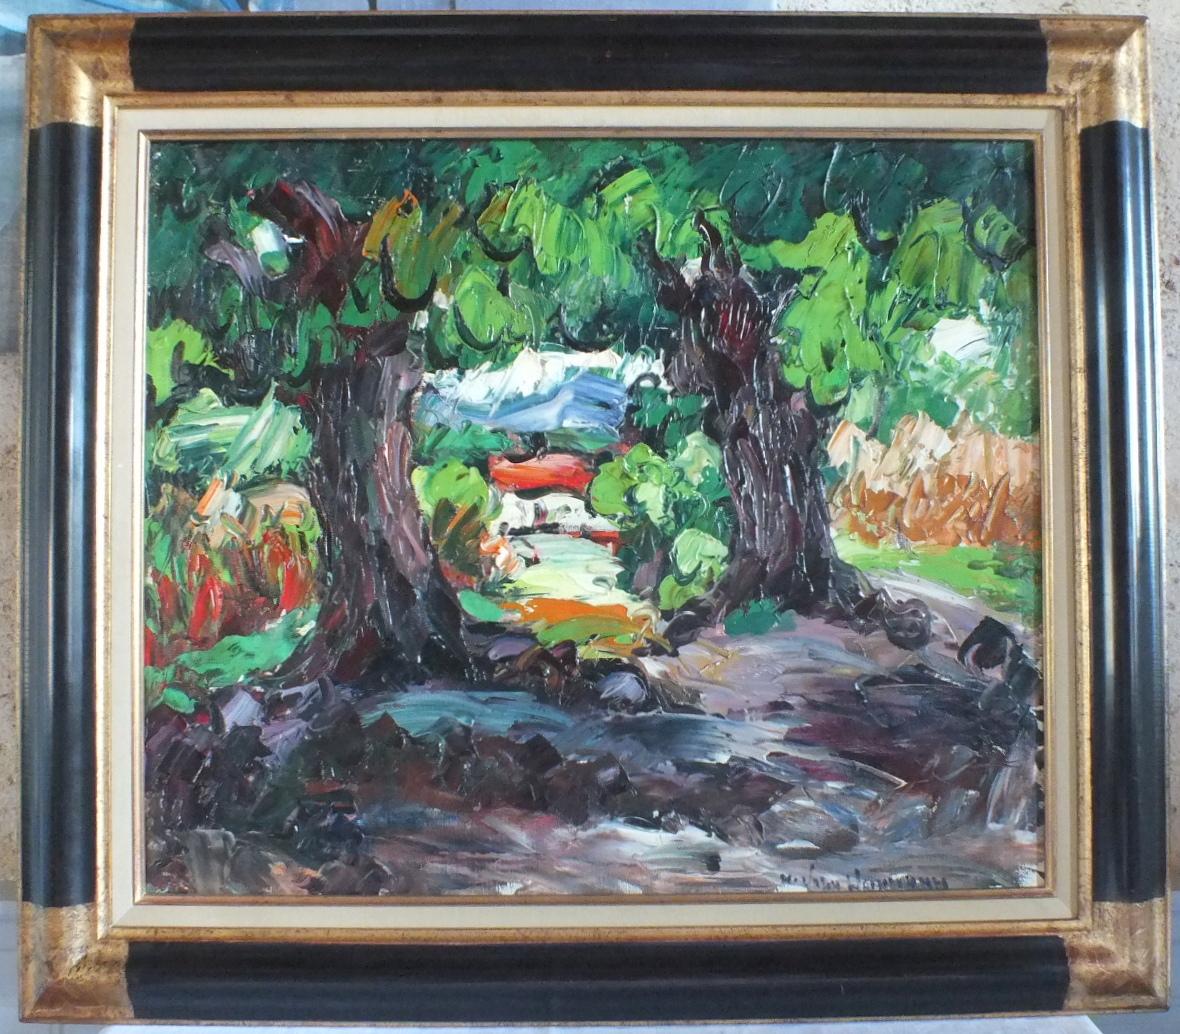 Hst Huile Sur Toile Maurice Vagh Weinmann Village Peinture Tableau